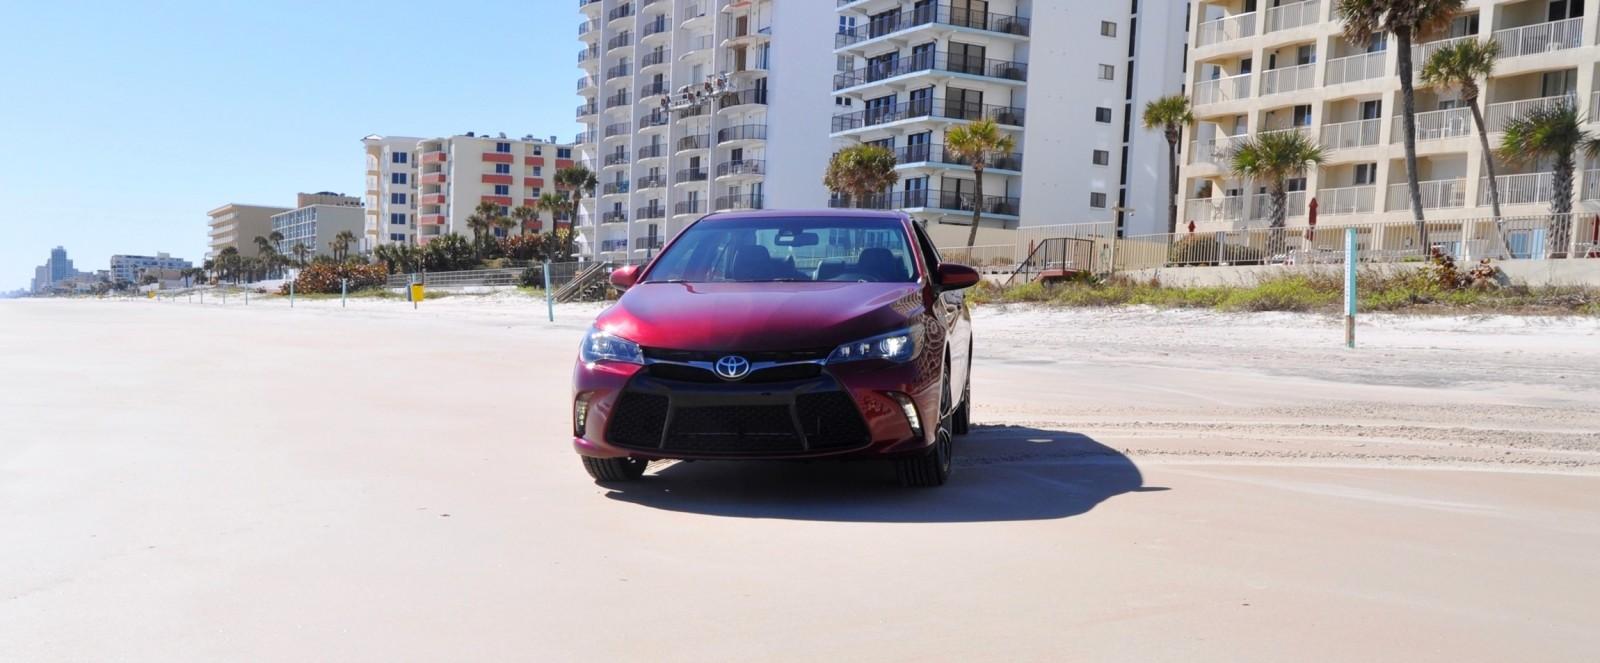 2015 Toyota Camry NASCAR Daytona Beach 1